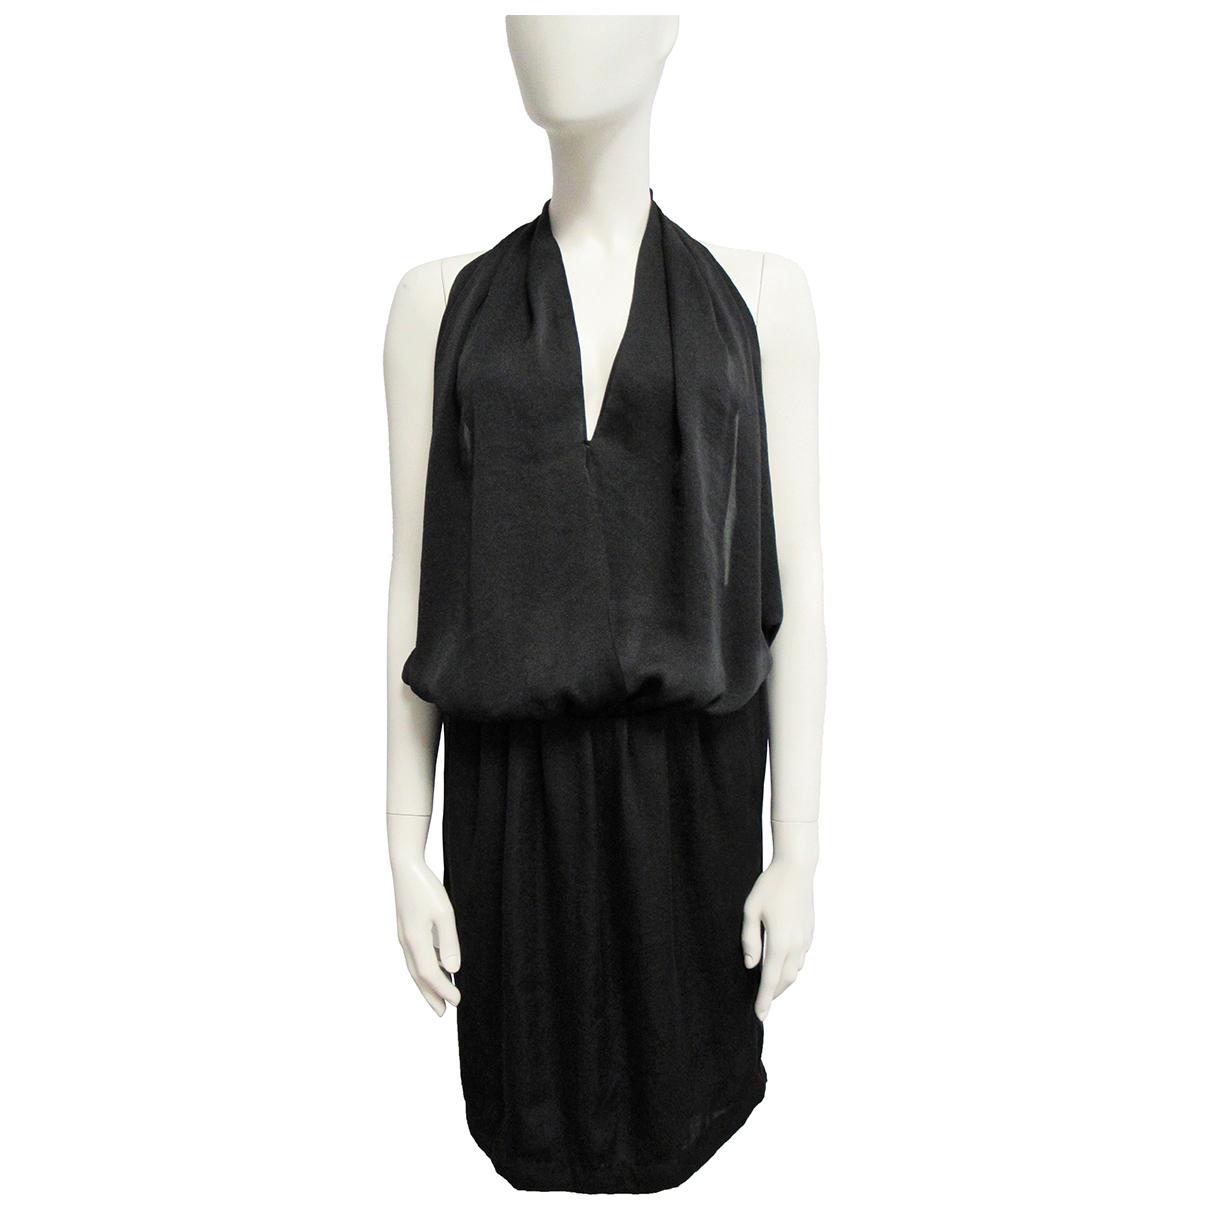 Mauro Grifoni \N Black dress for Women 42 IT